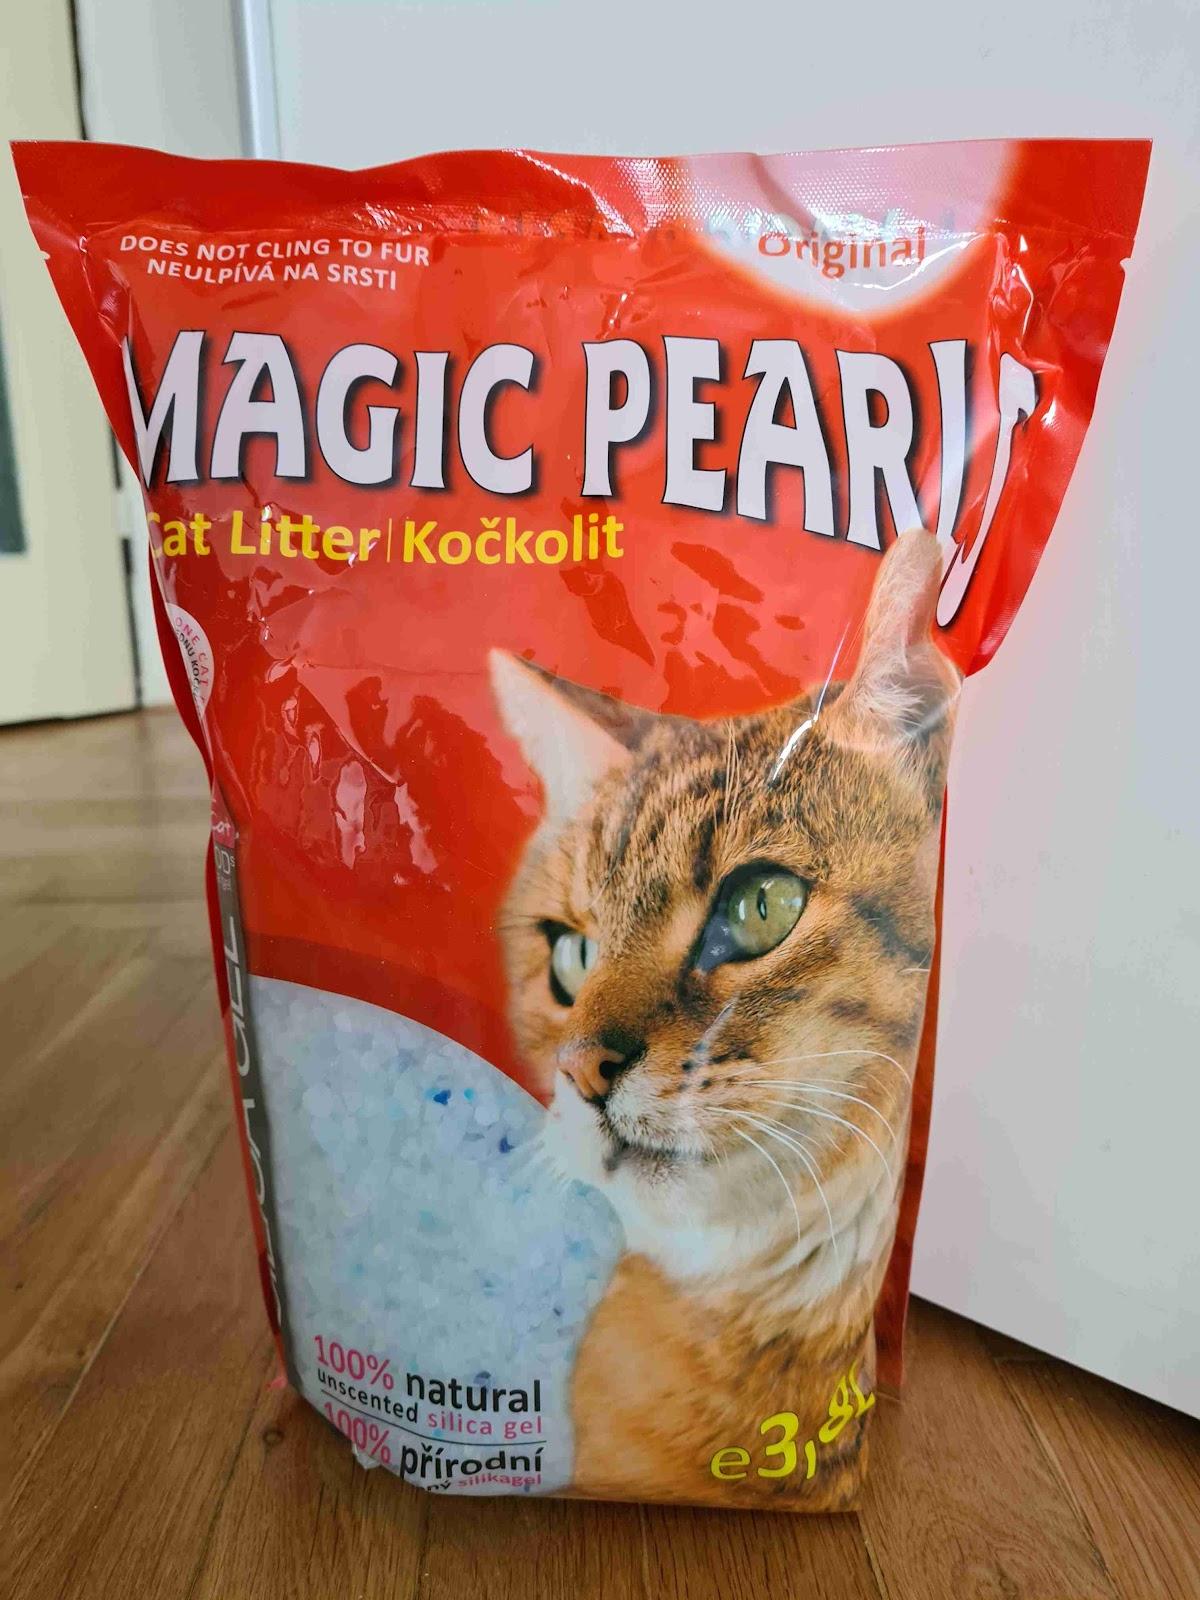 Recenze Superzoo.cz: Kočkolit Magic Pearls Original